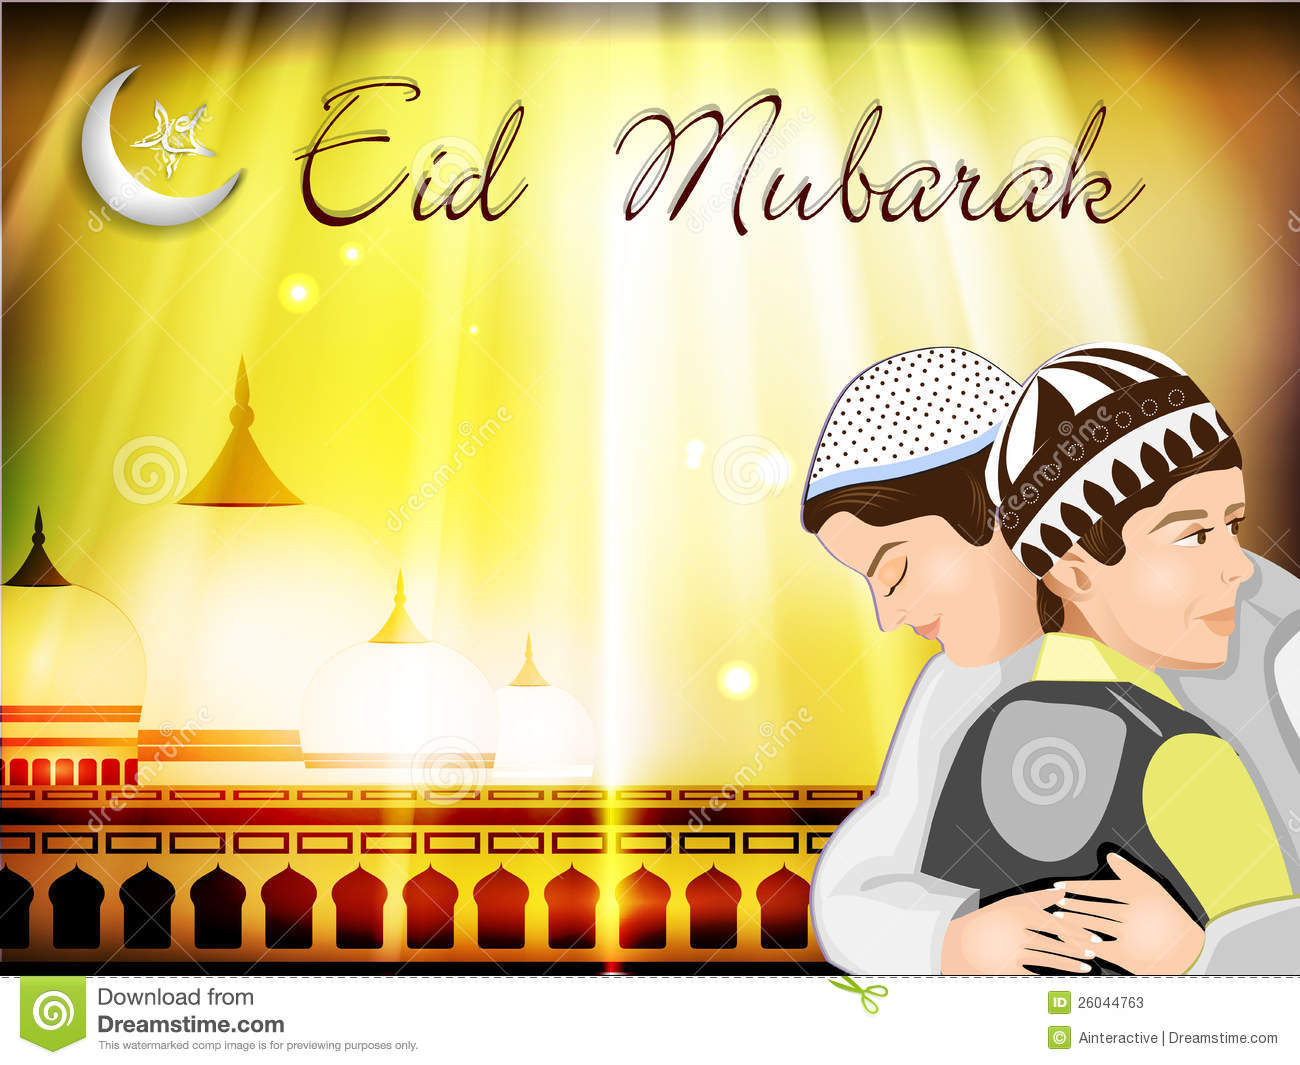 New eid mubarak clipart.